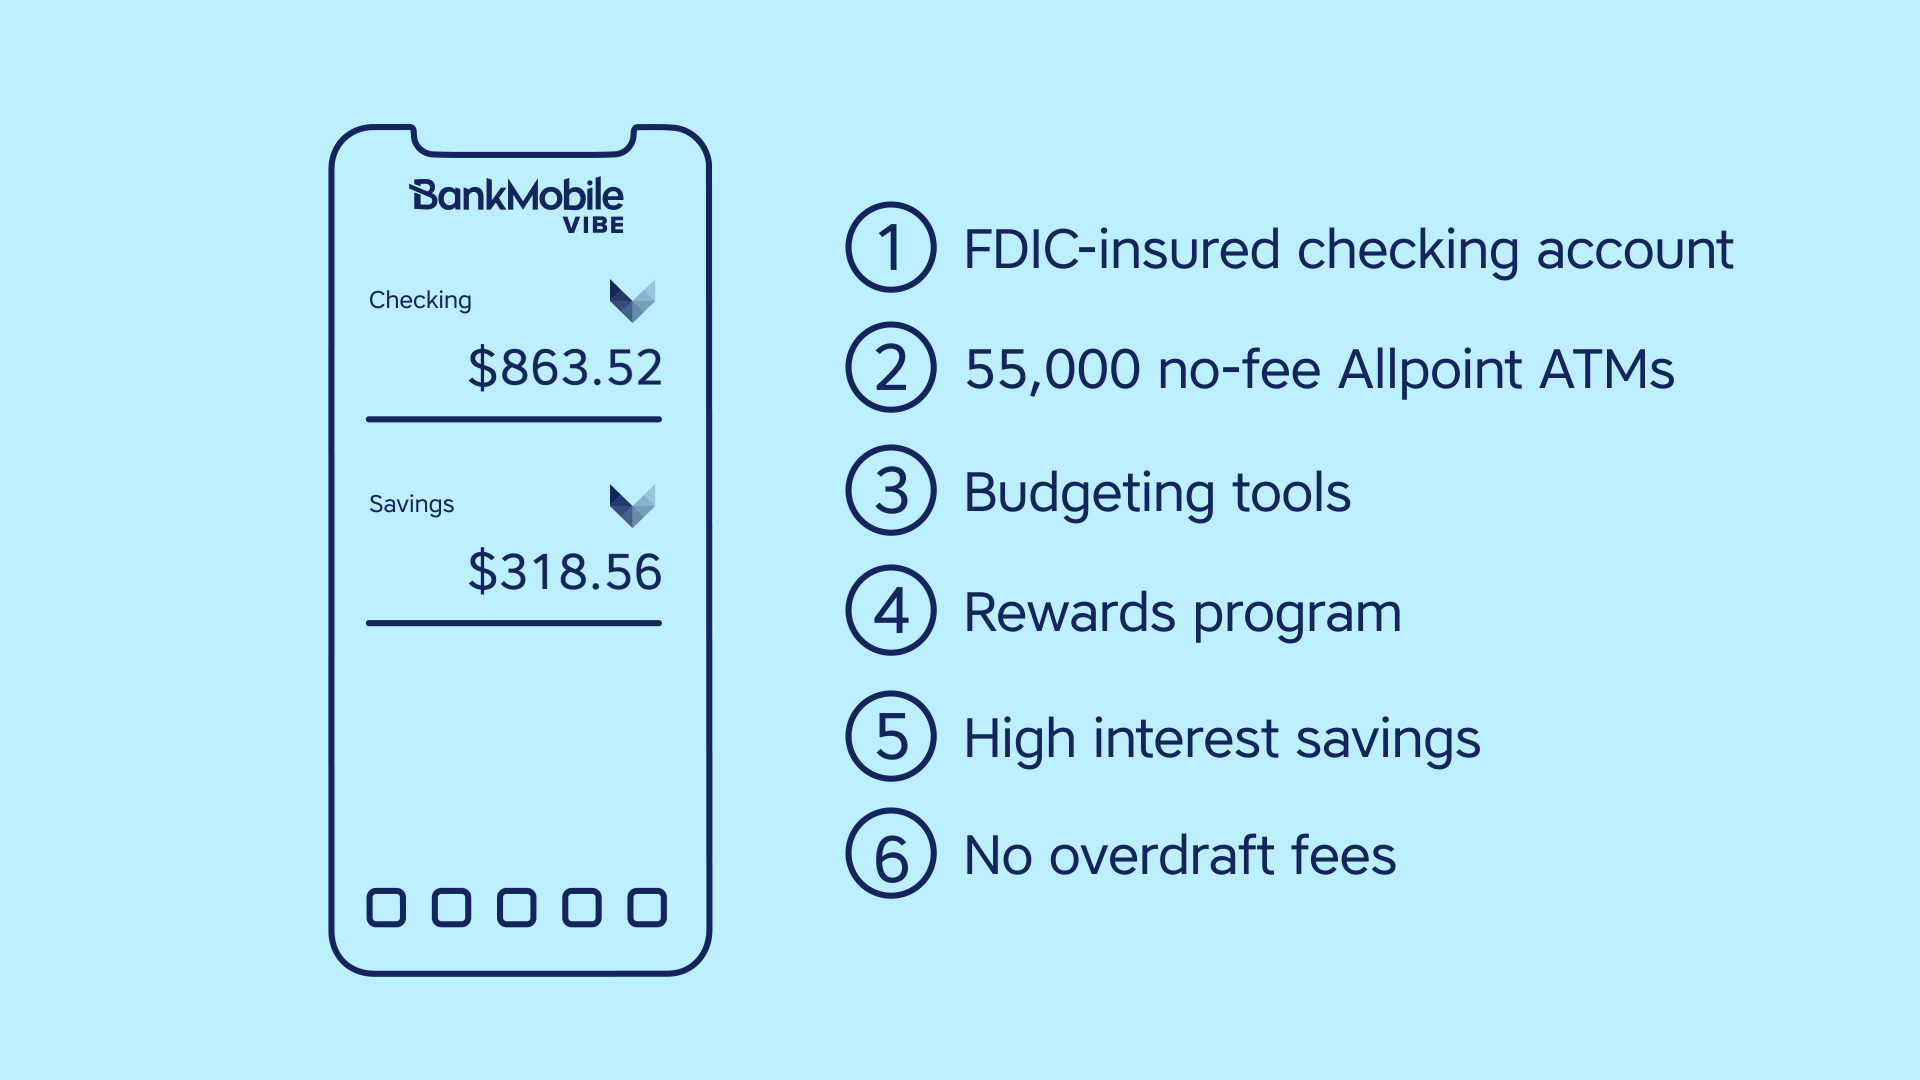 Screenshot of video listing benefits